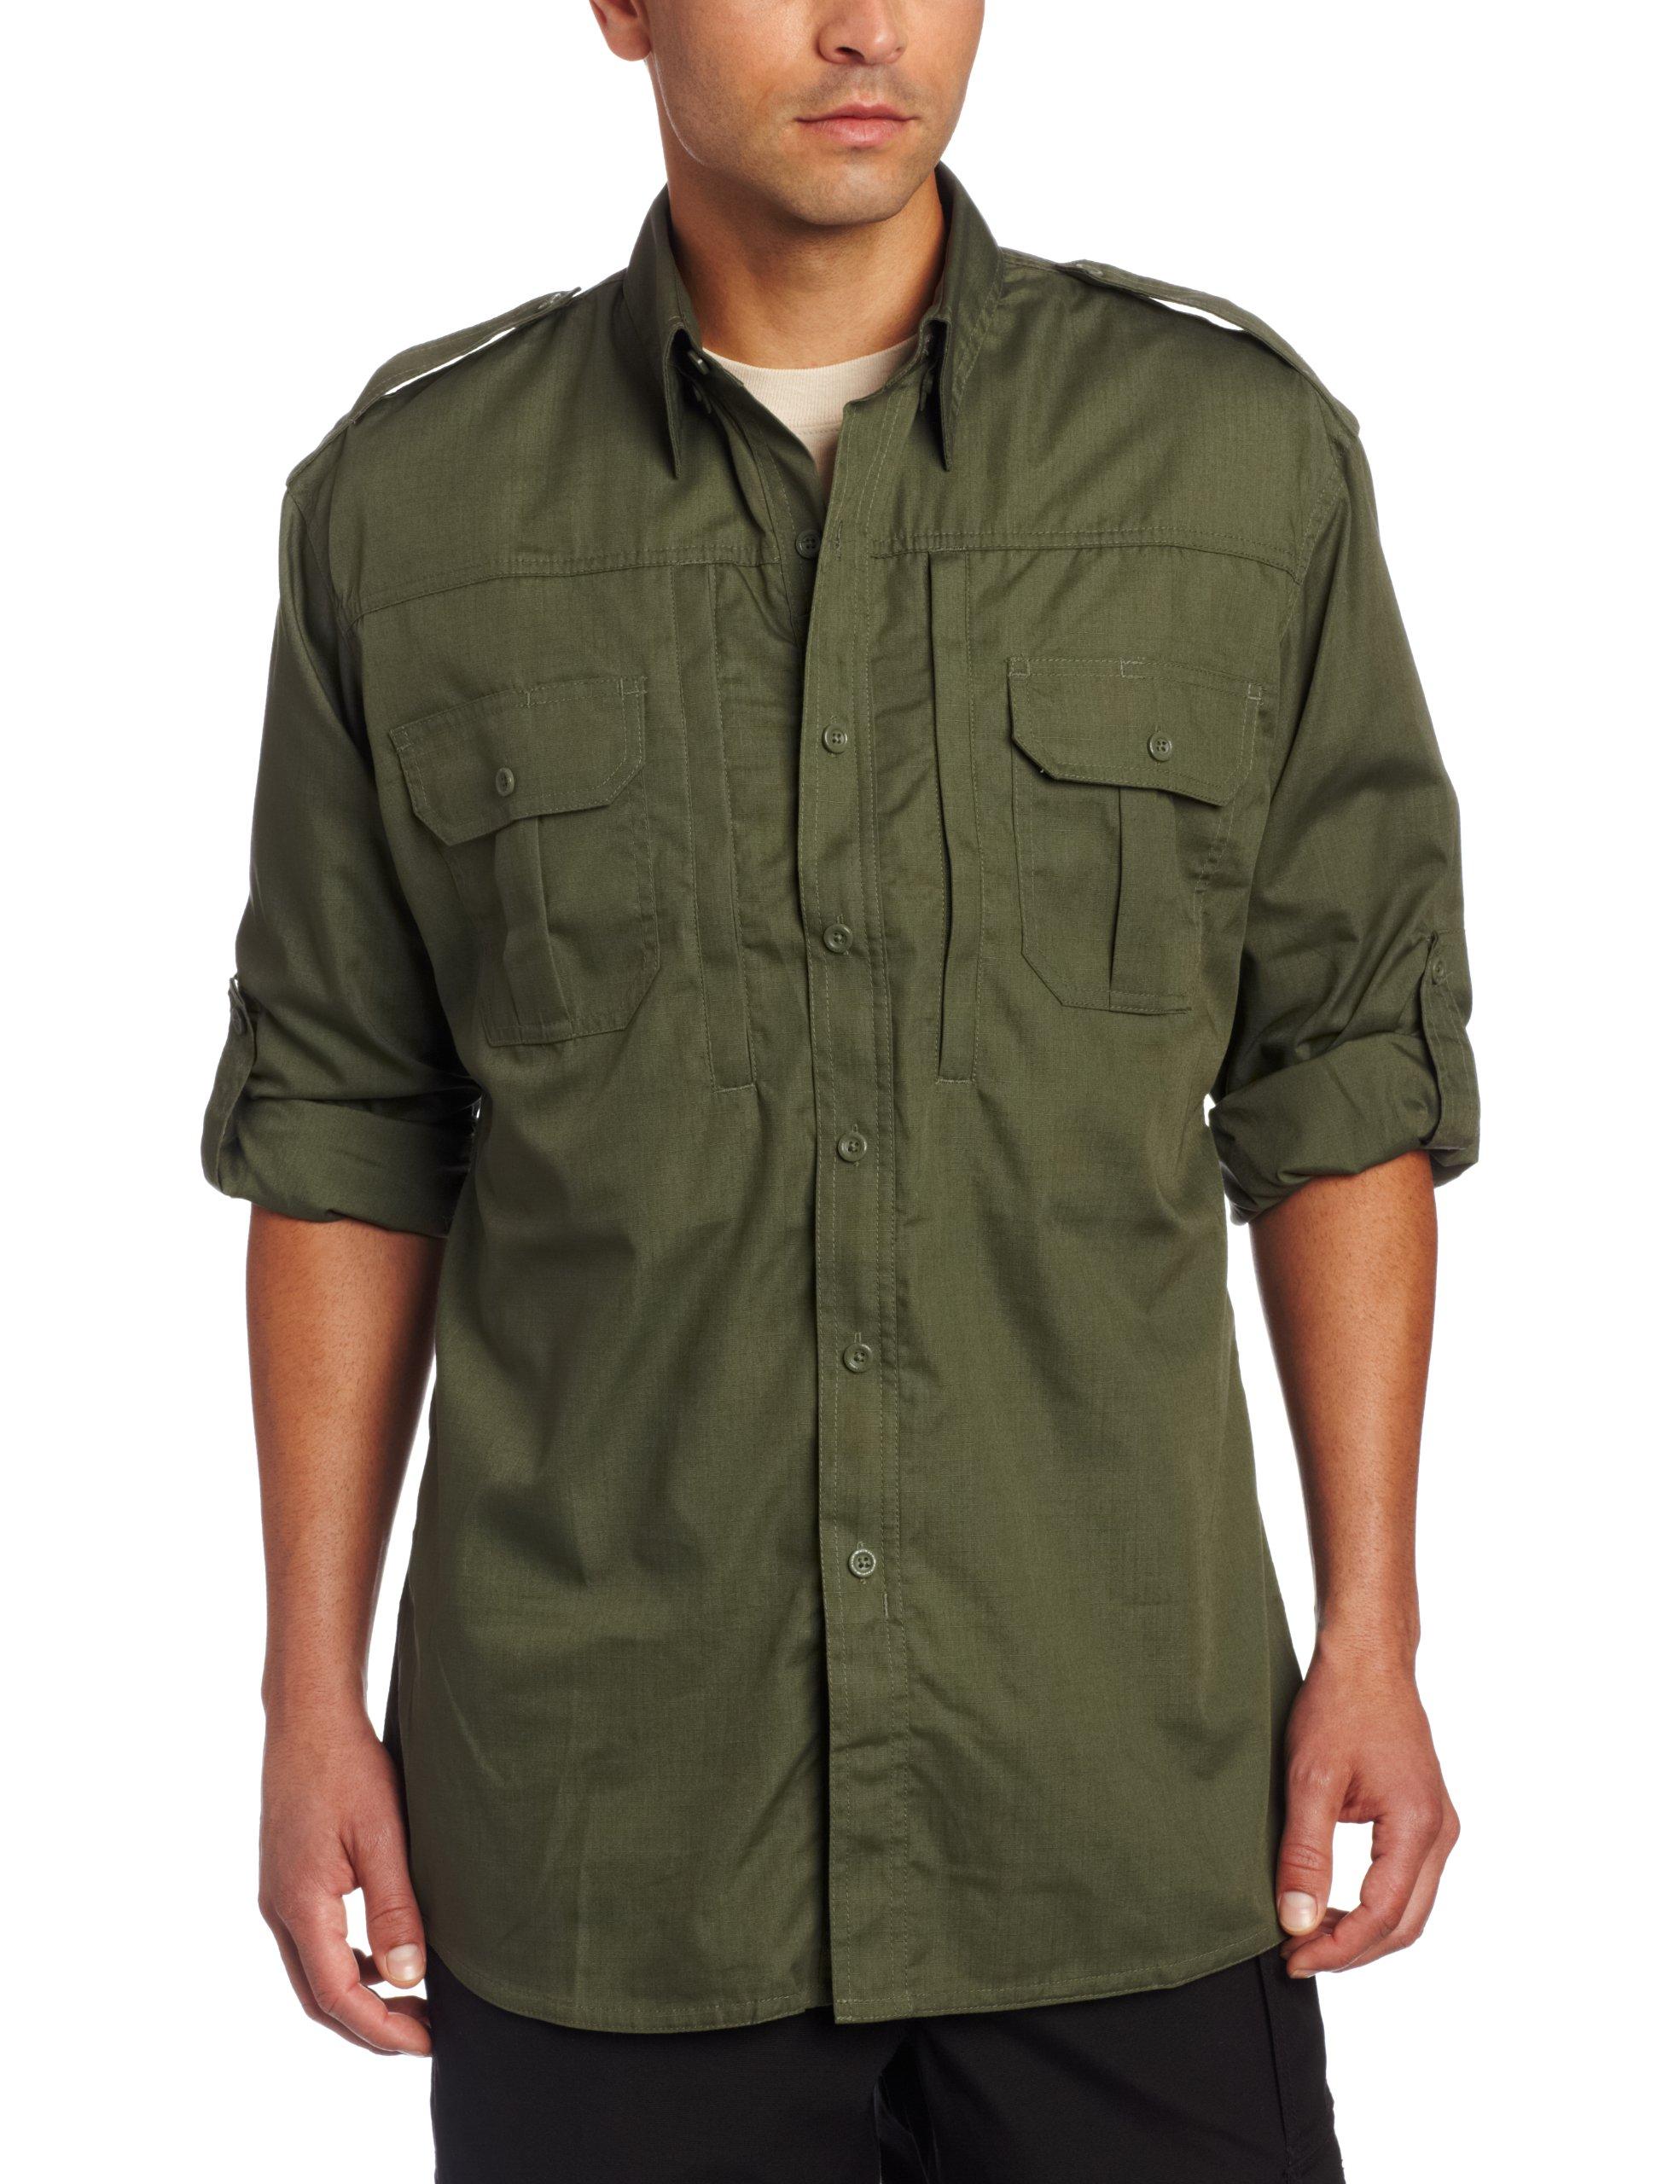 Propper Men's Long Sleeve Tactical Shirt - Large - Olive by Propper